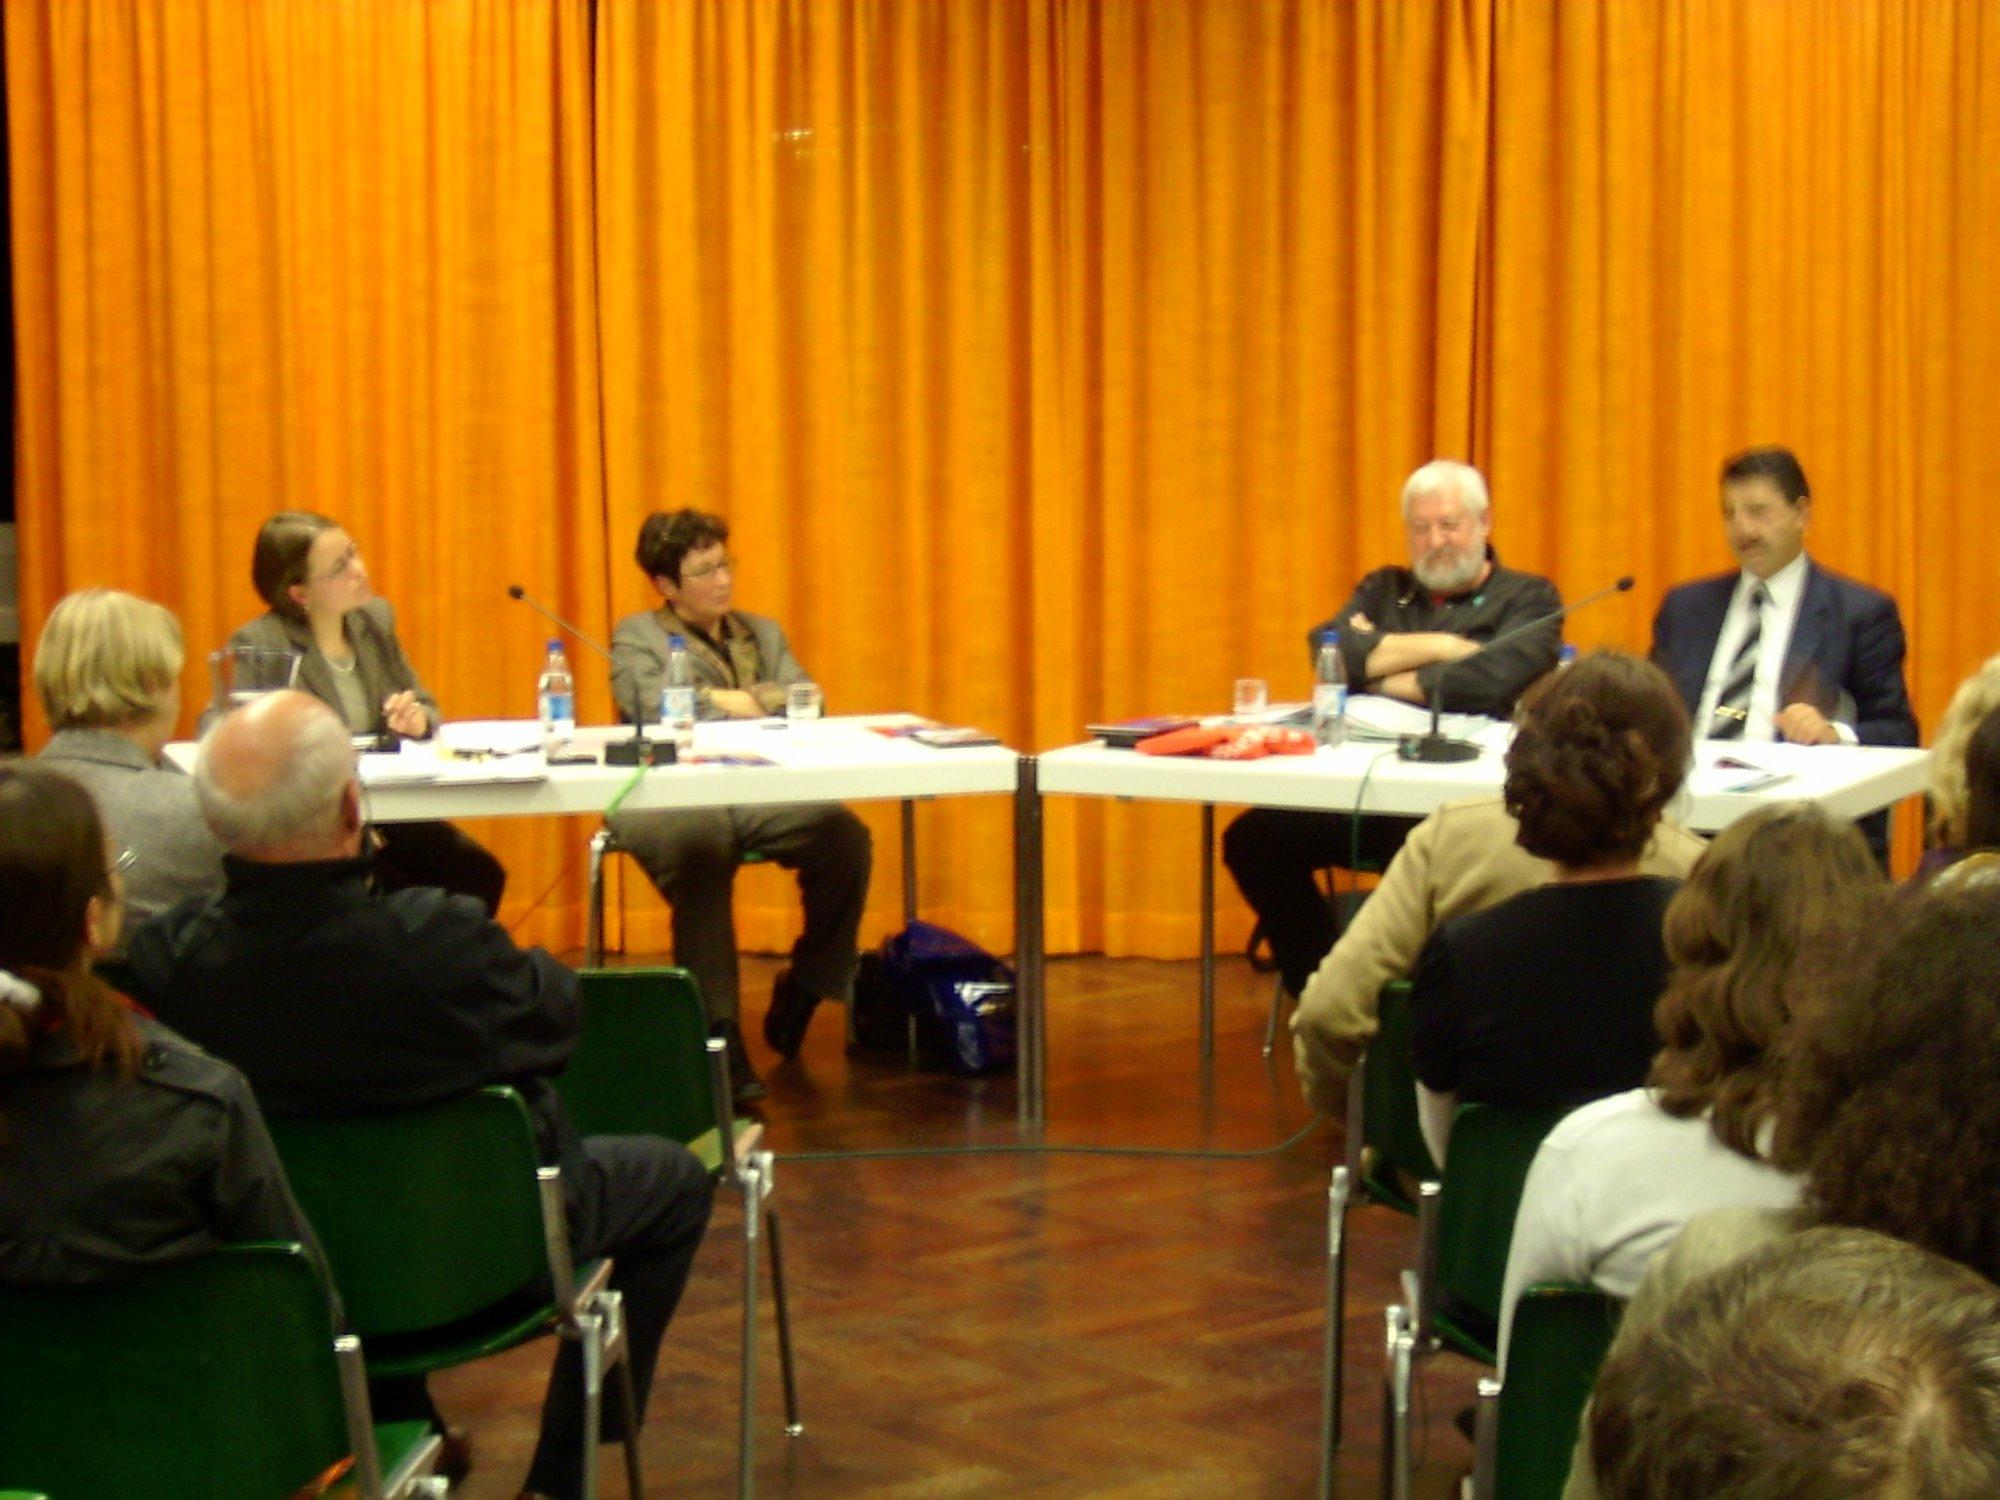 Interkultureller Monat Erlangen 2008